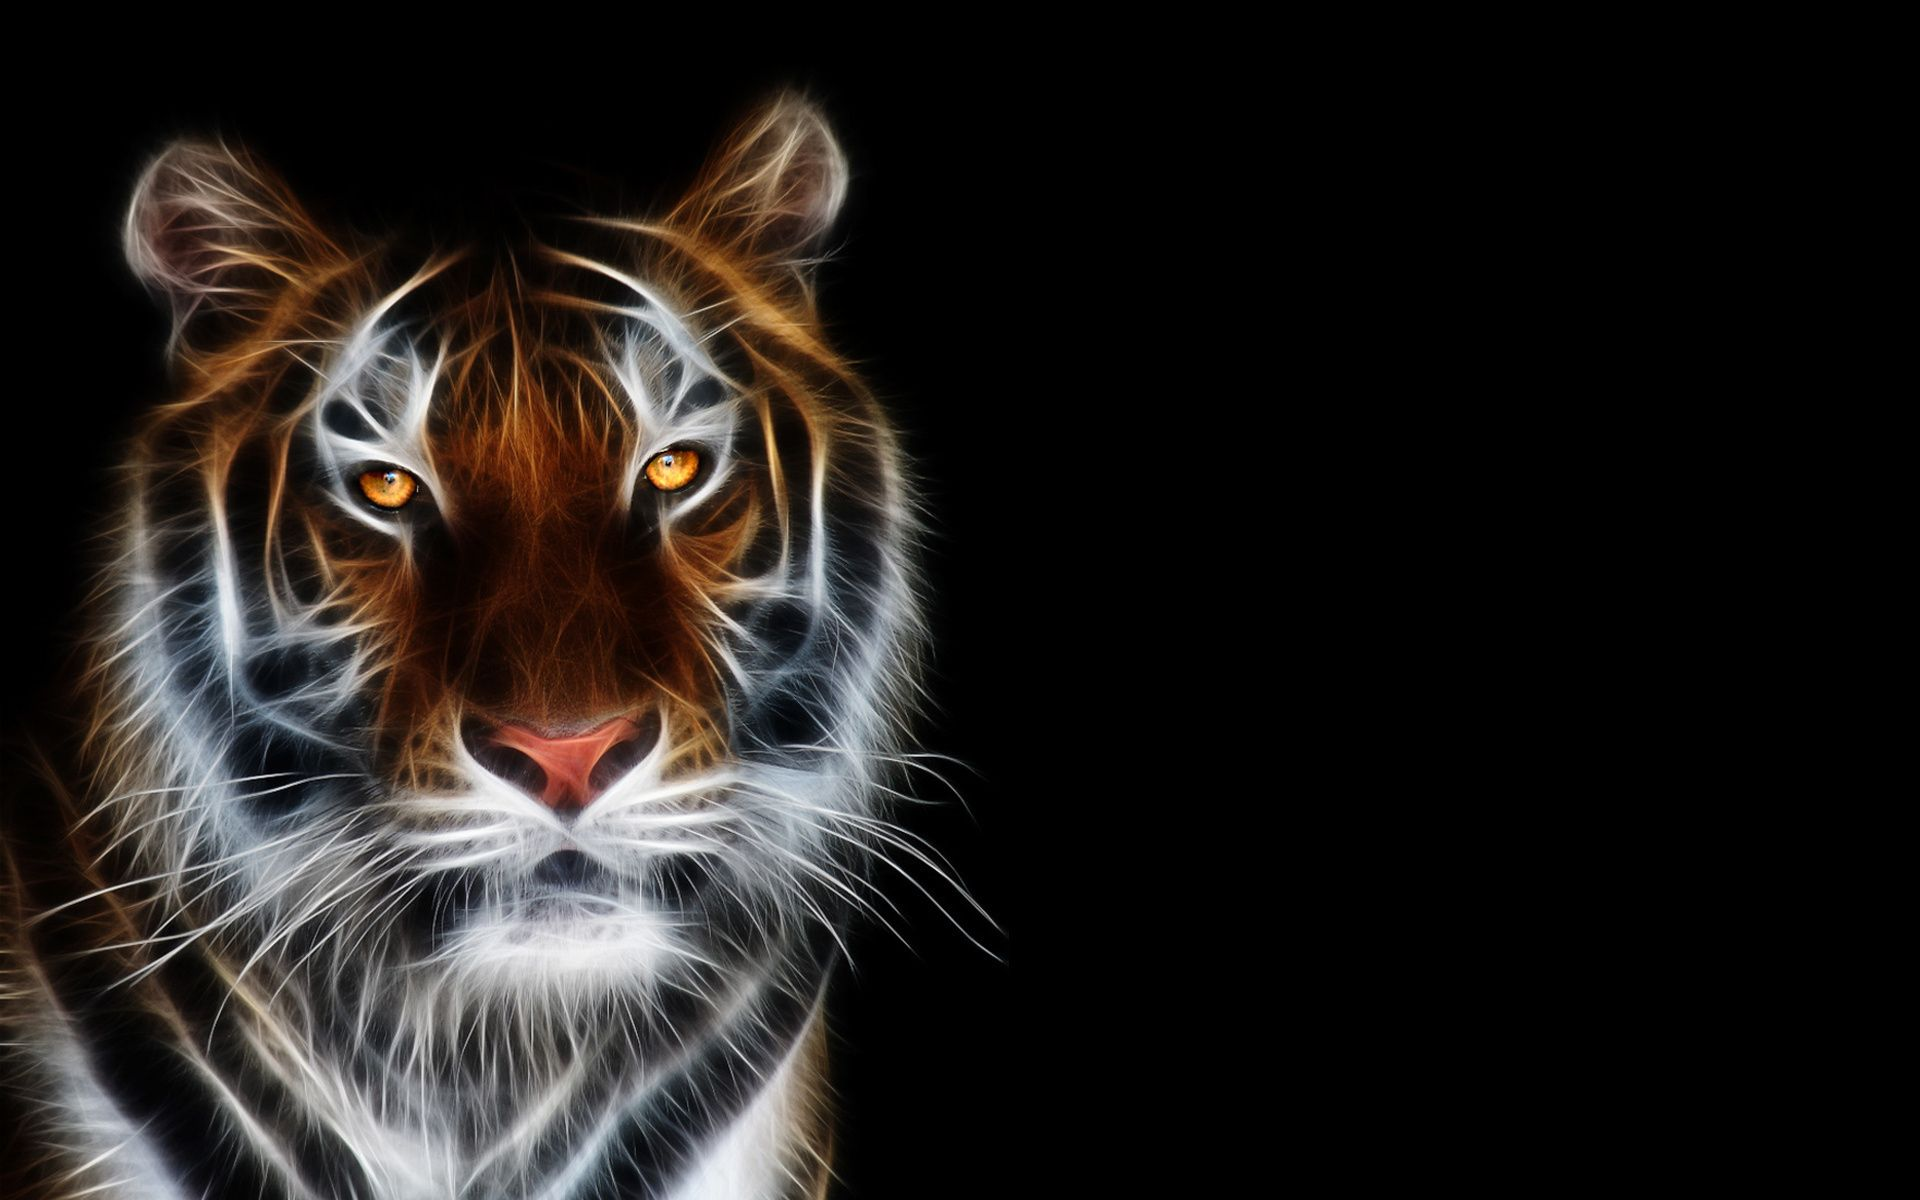 3d Tiger Animals Hd Wallpapers Idee Pinterest Tiger Wallpaper